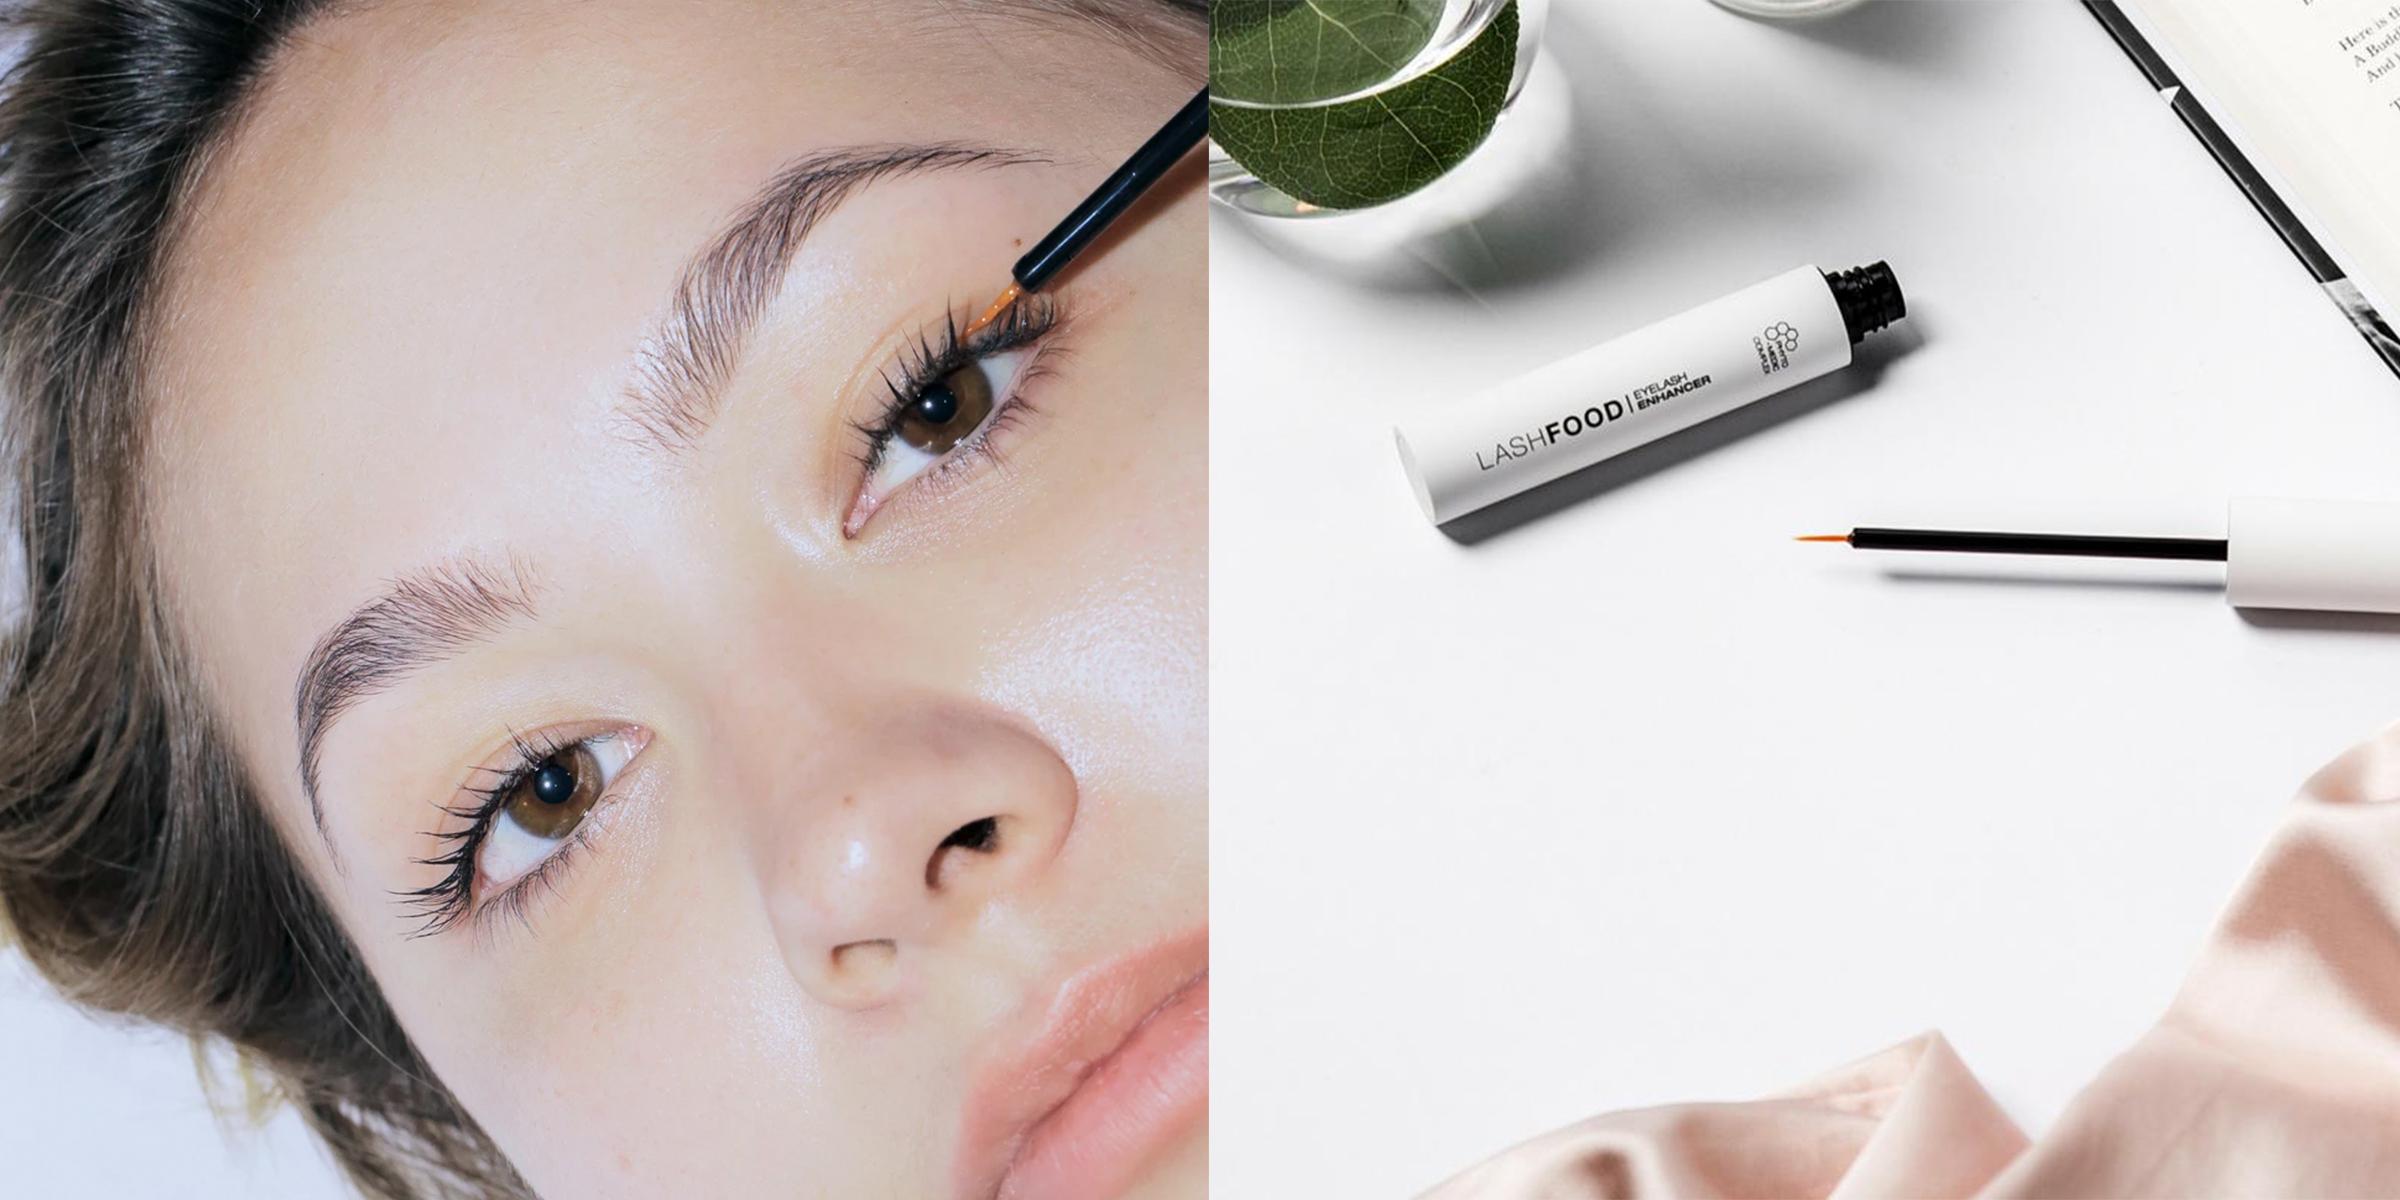 Eyelash Serums As Agents For Thick Eyelashes